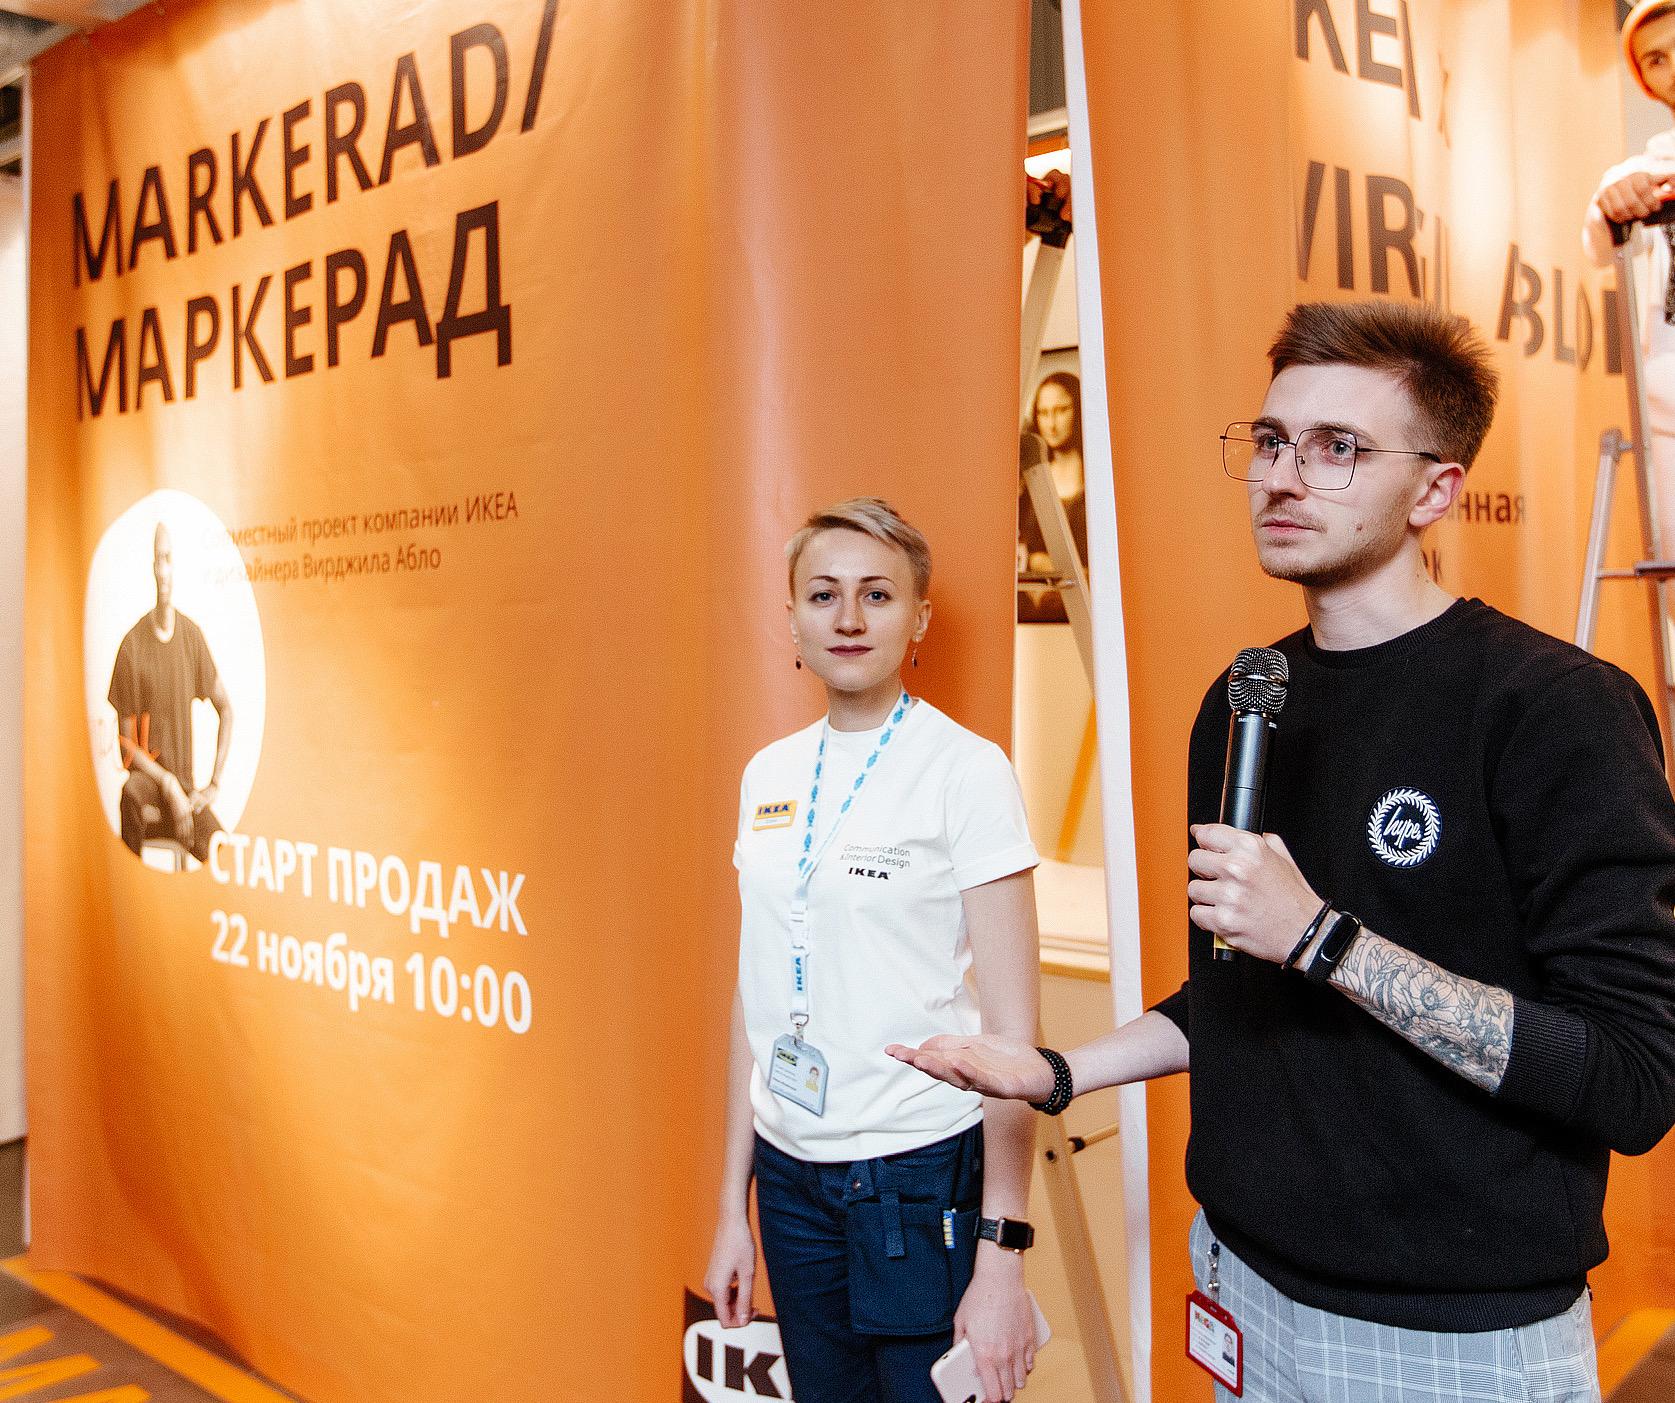 Александр Даняев: маркетинг в условиях неопределенности